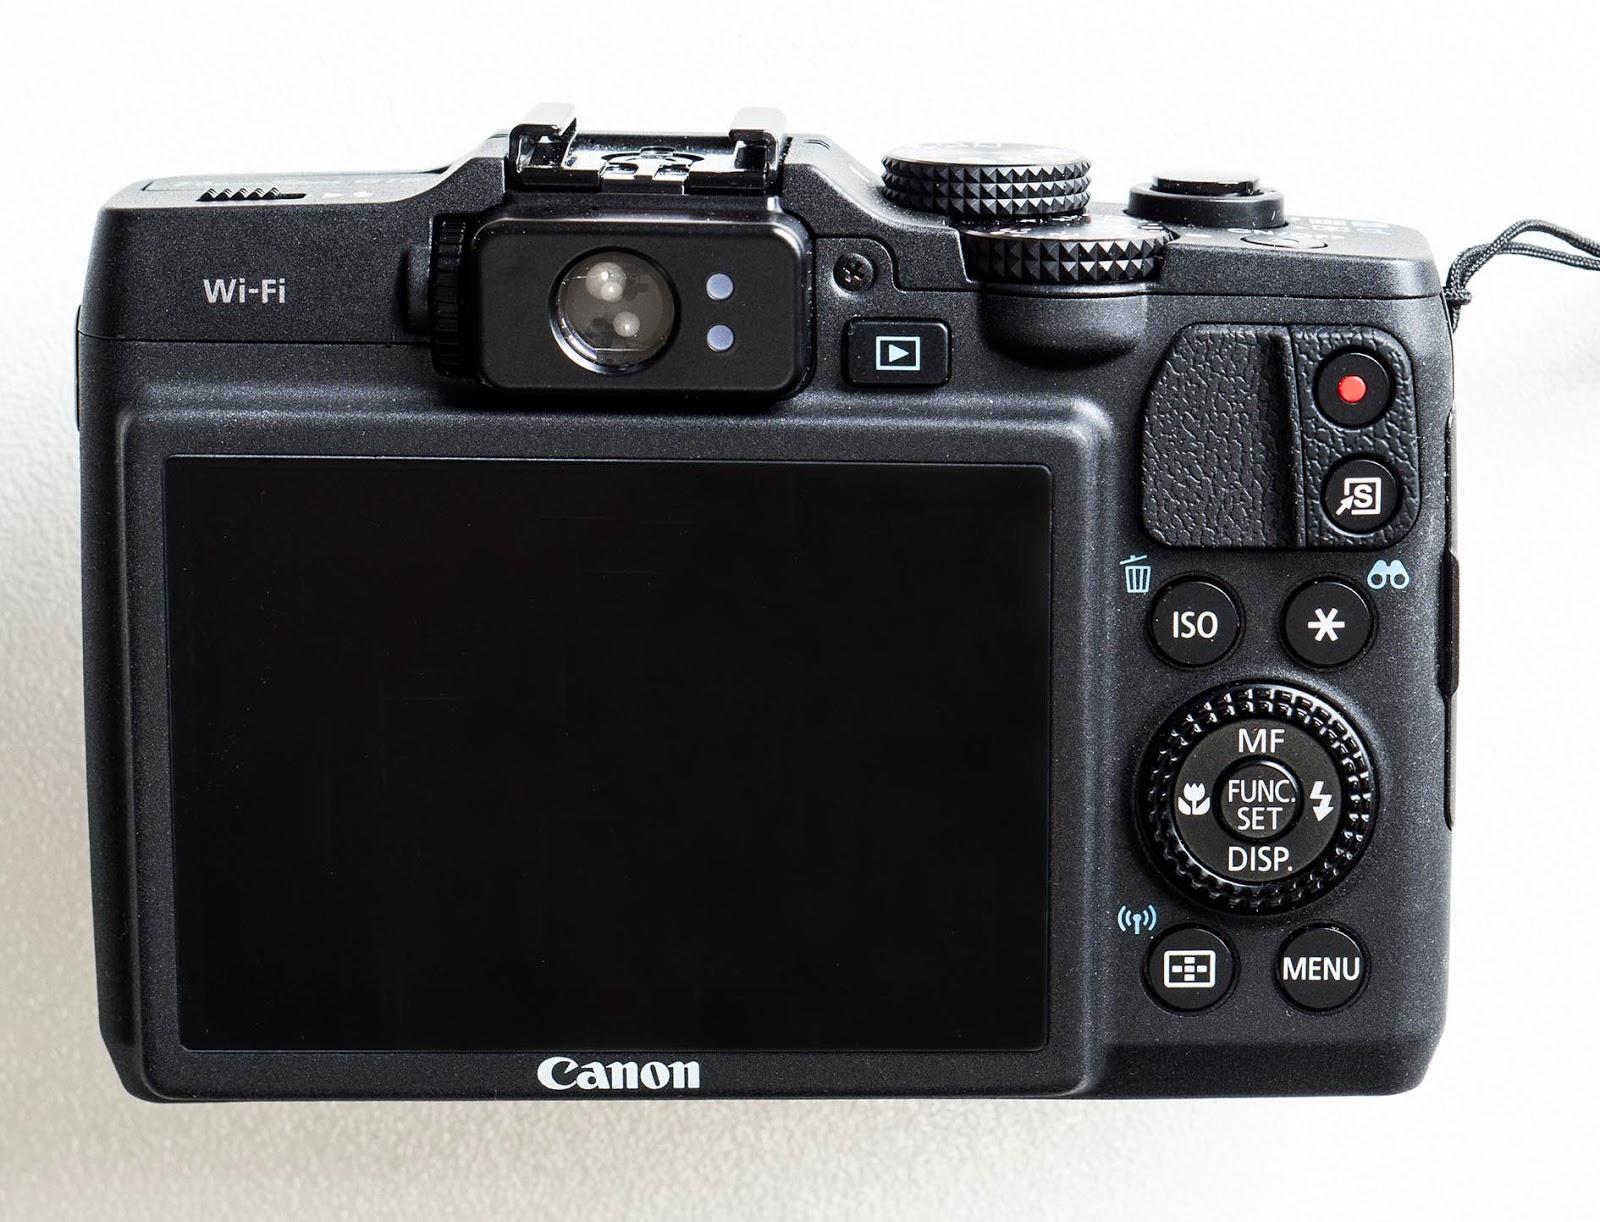 Canon g16 advanced compact camera review camera ergonomics